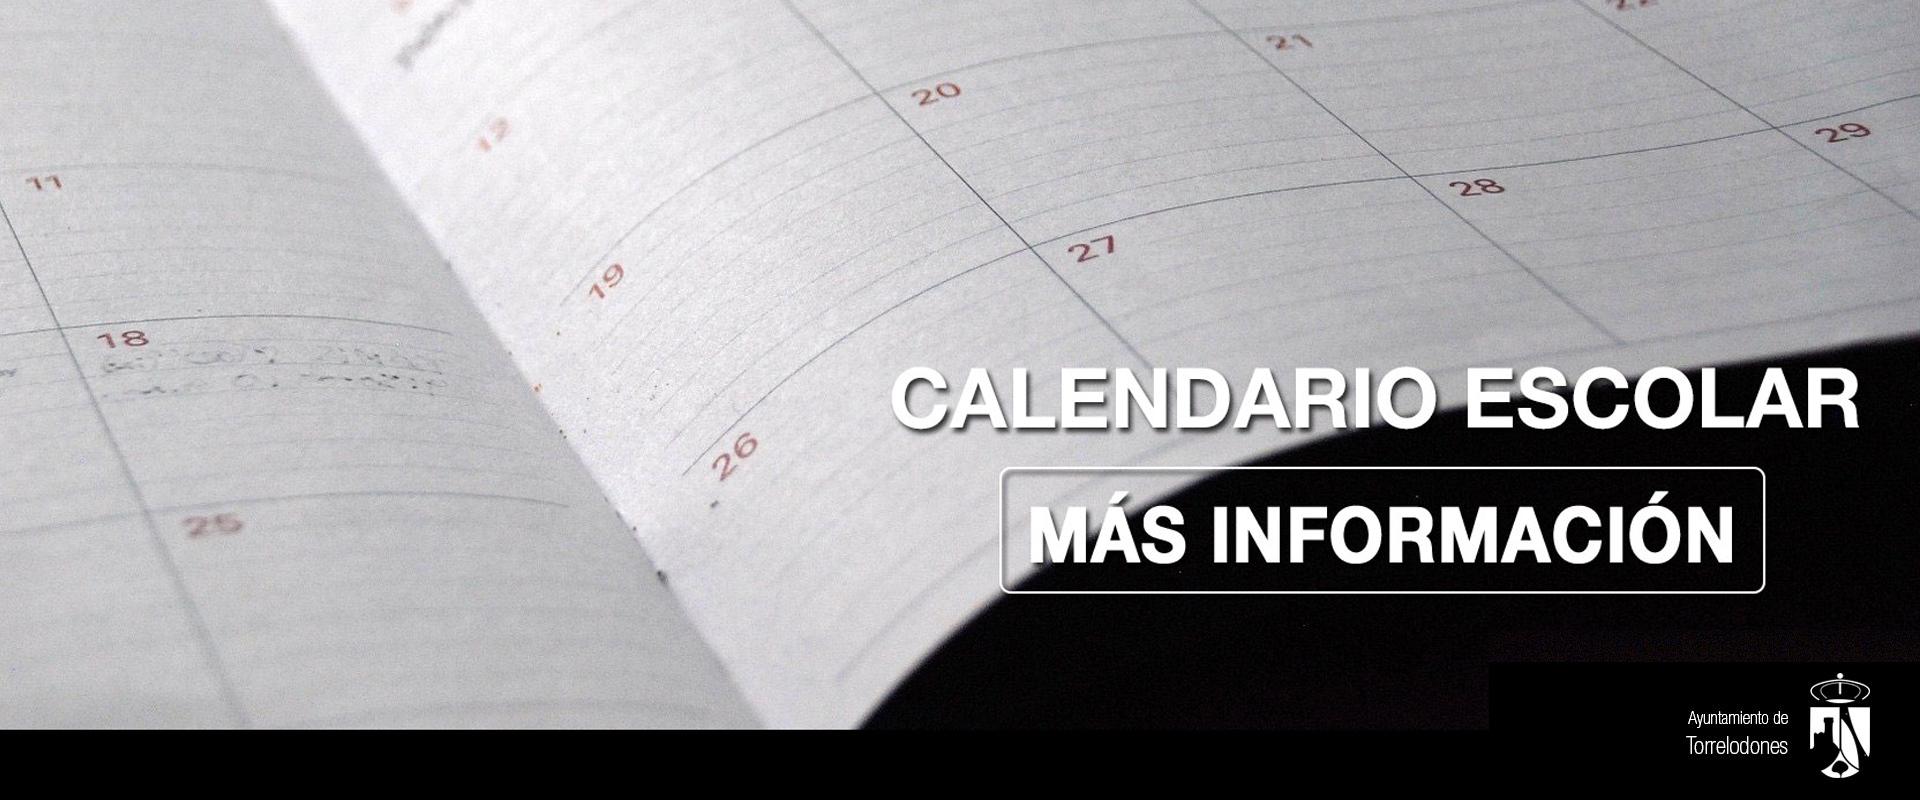 slider-calendario-escolar